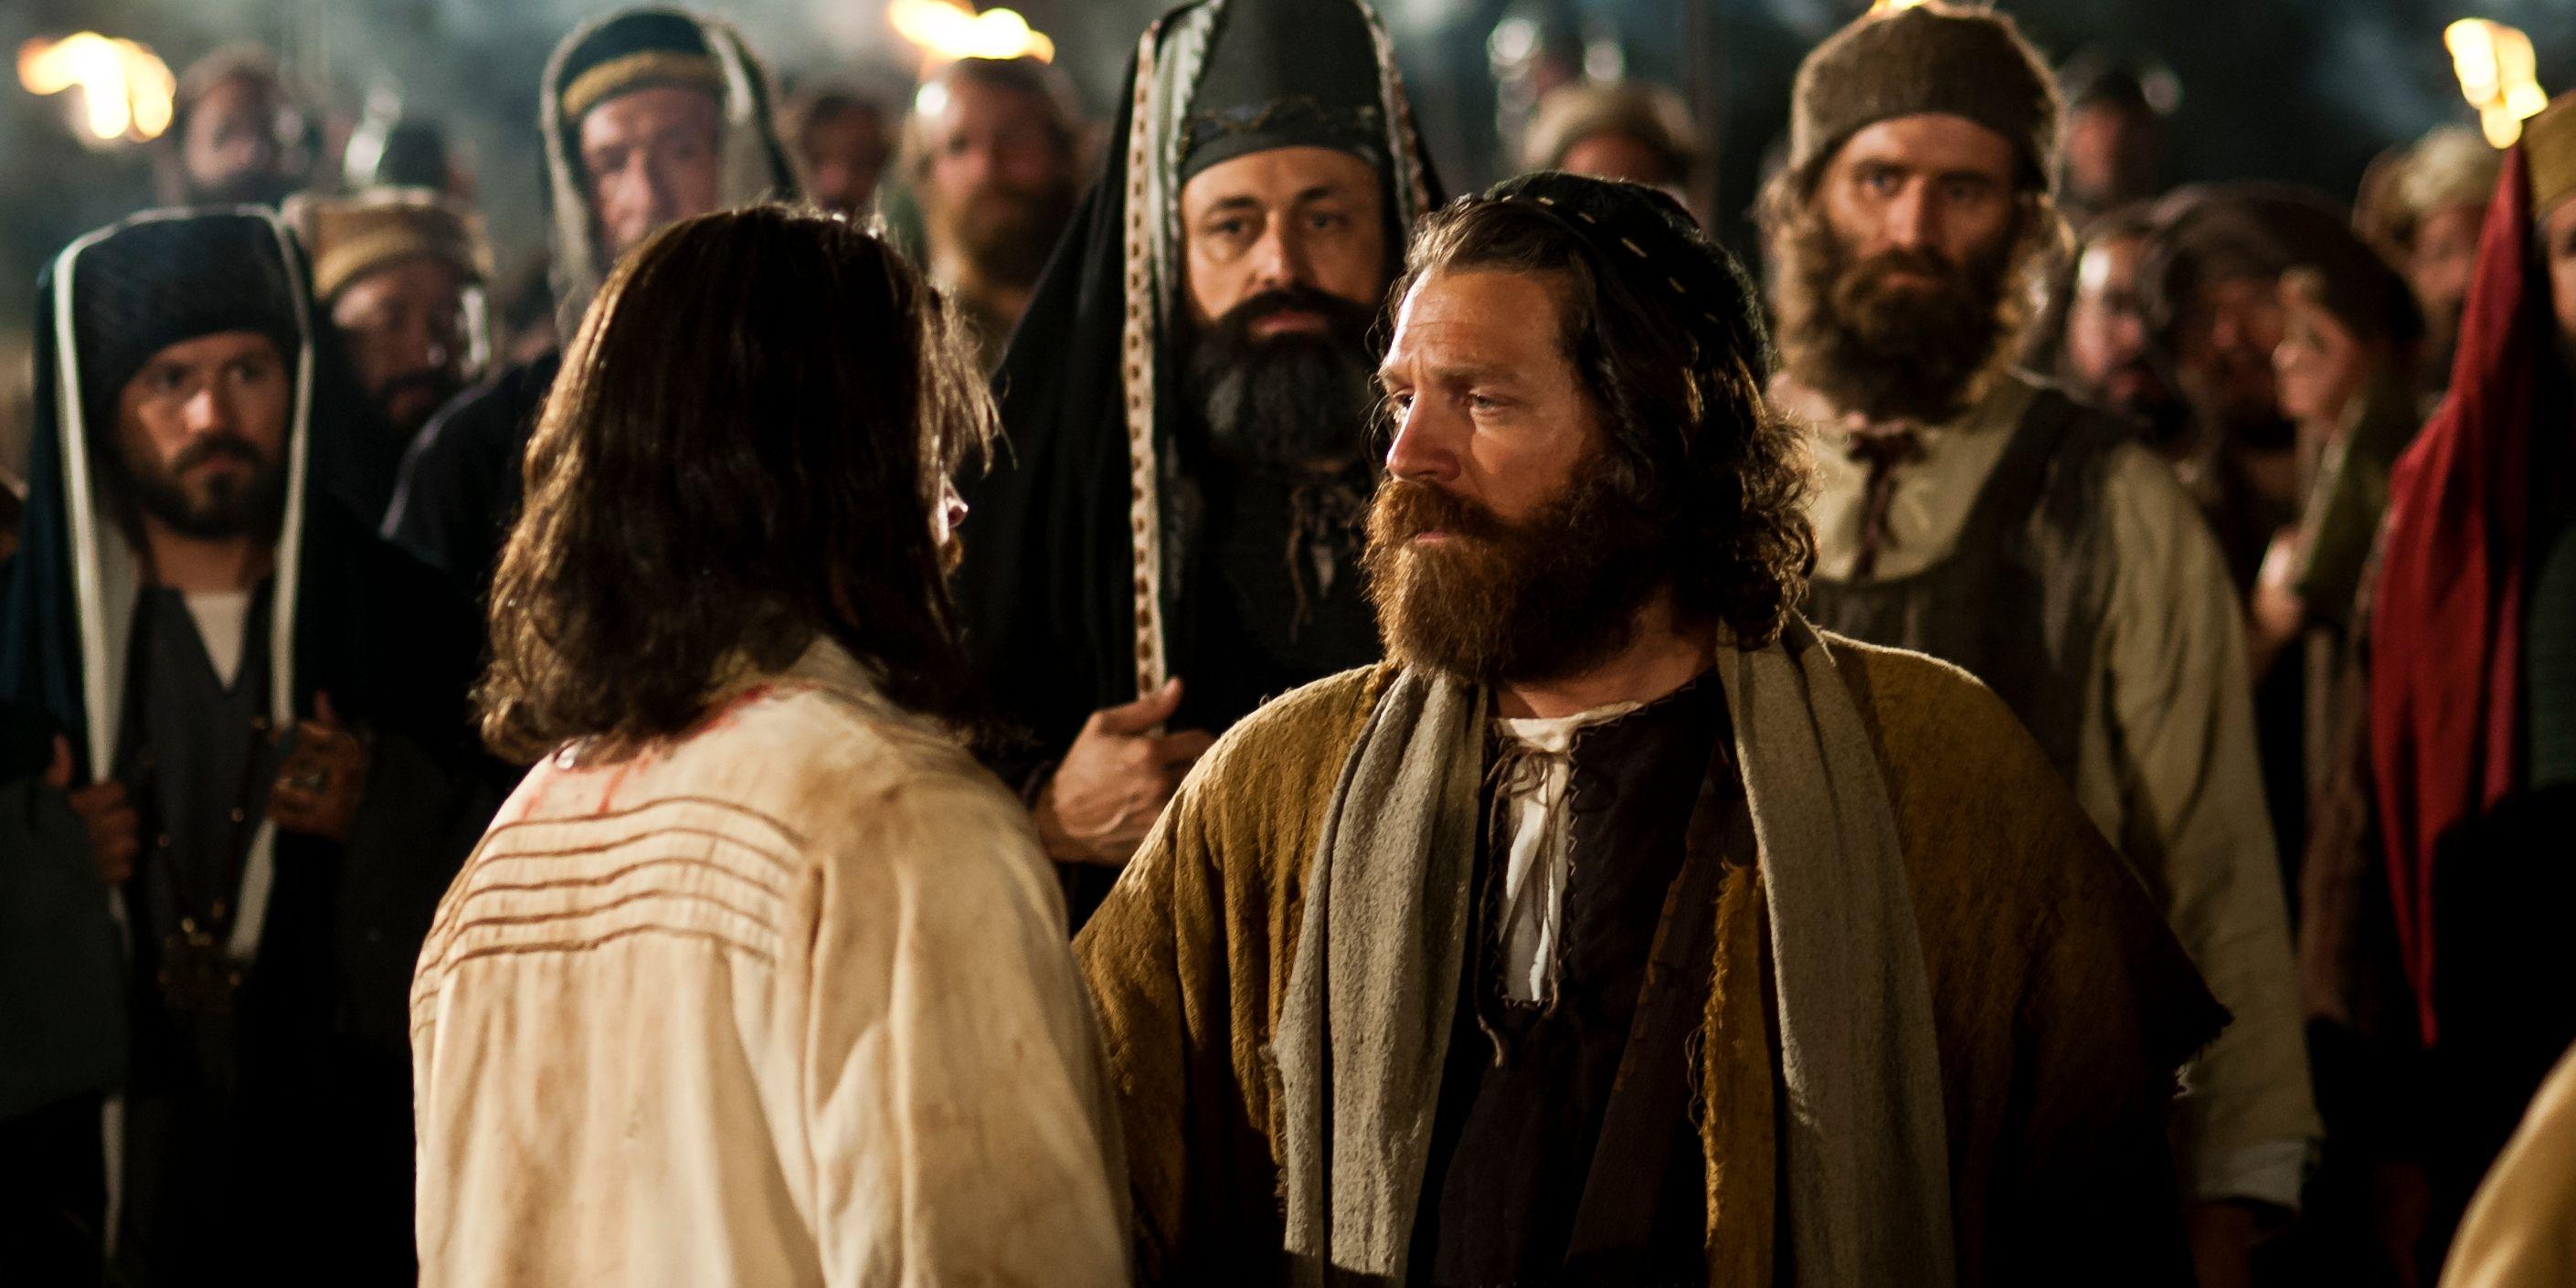 Judas kisses Christ's cheek in an act of betrayal.